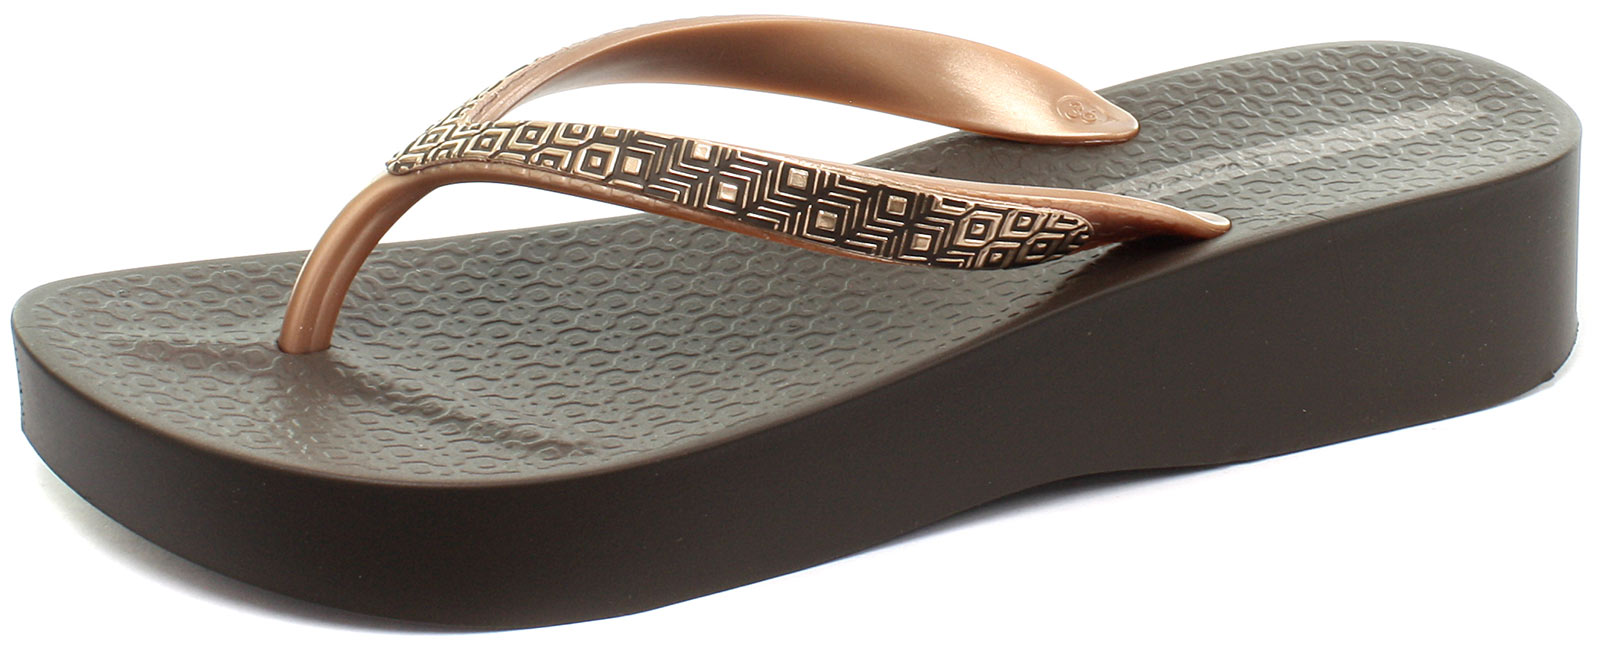 de71f316dca6fb Ipanema Brasil Mesh II Platform Brown Womens Flip Flops Size UK 8 EU 41 42  1 of 6Only 1 available ...